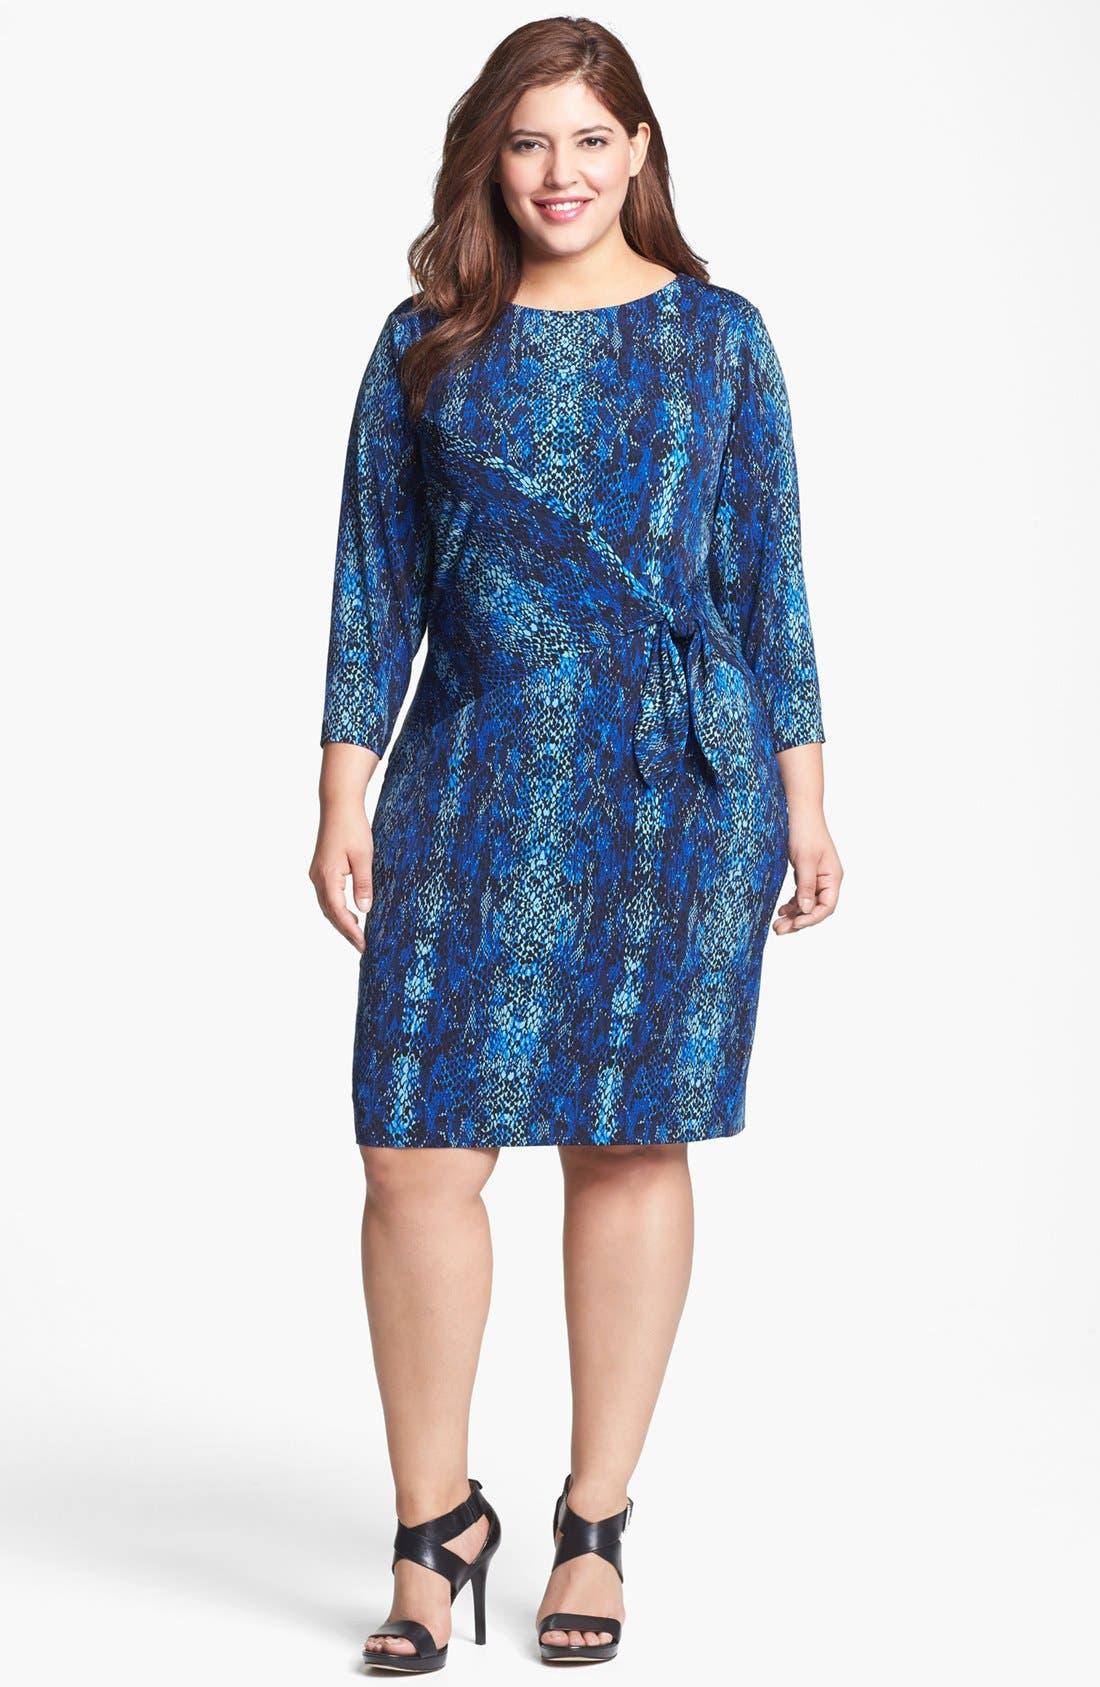 Alternate Image 1 Selected - Calvin Klein Print Side Tie Sheath Dress (Plus Size)